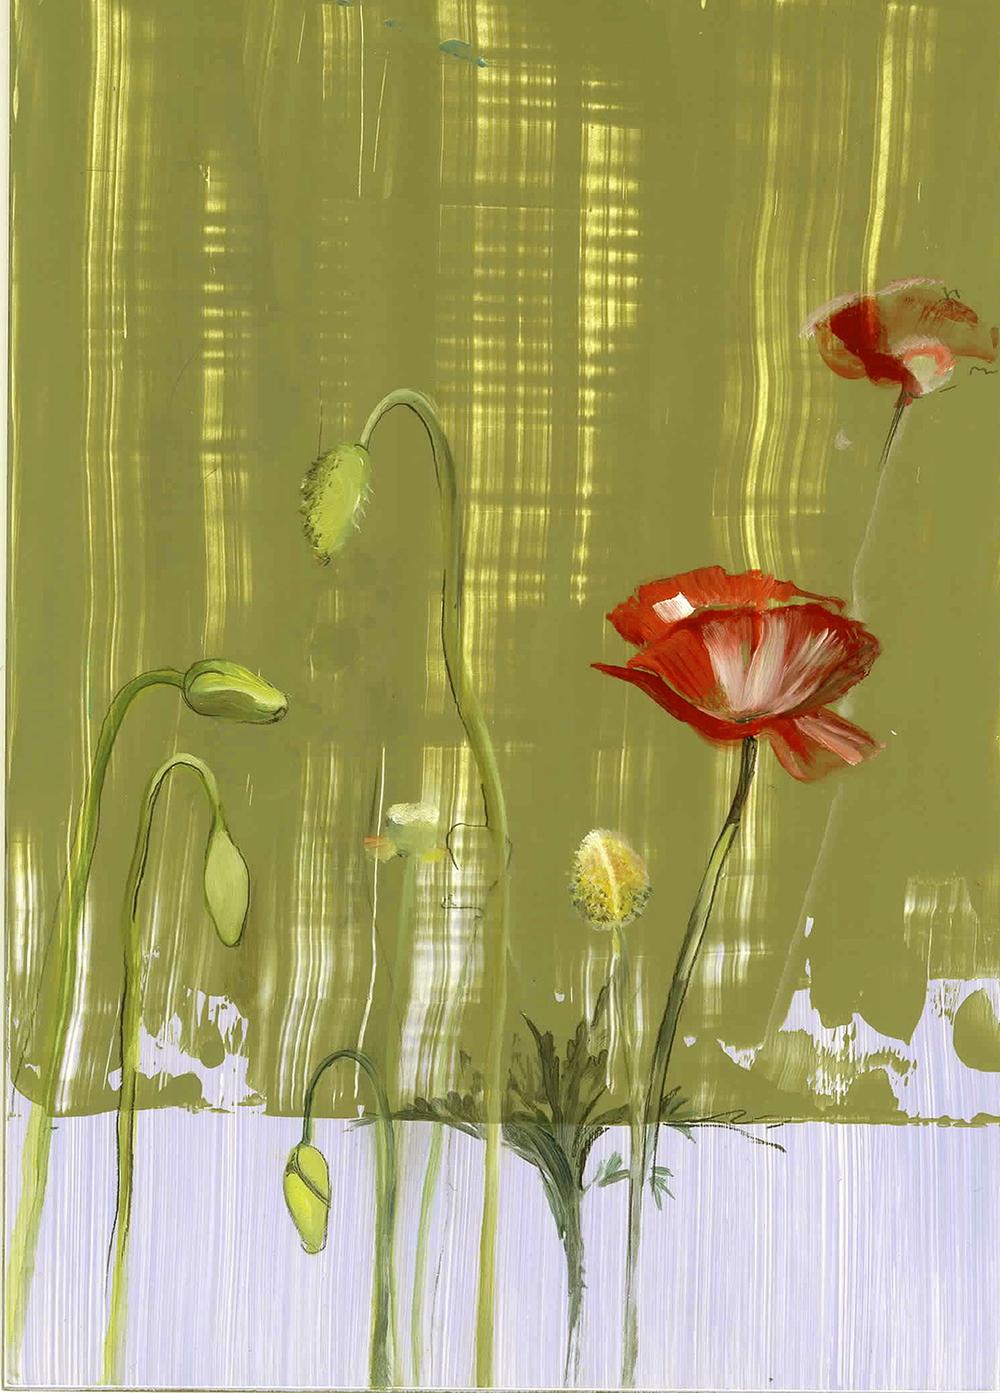 Poppy oil on panel 5x7, 2005